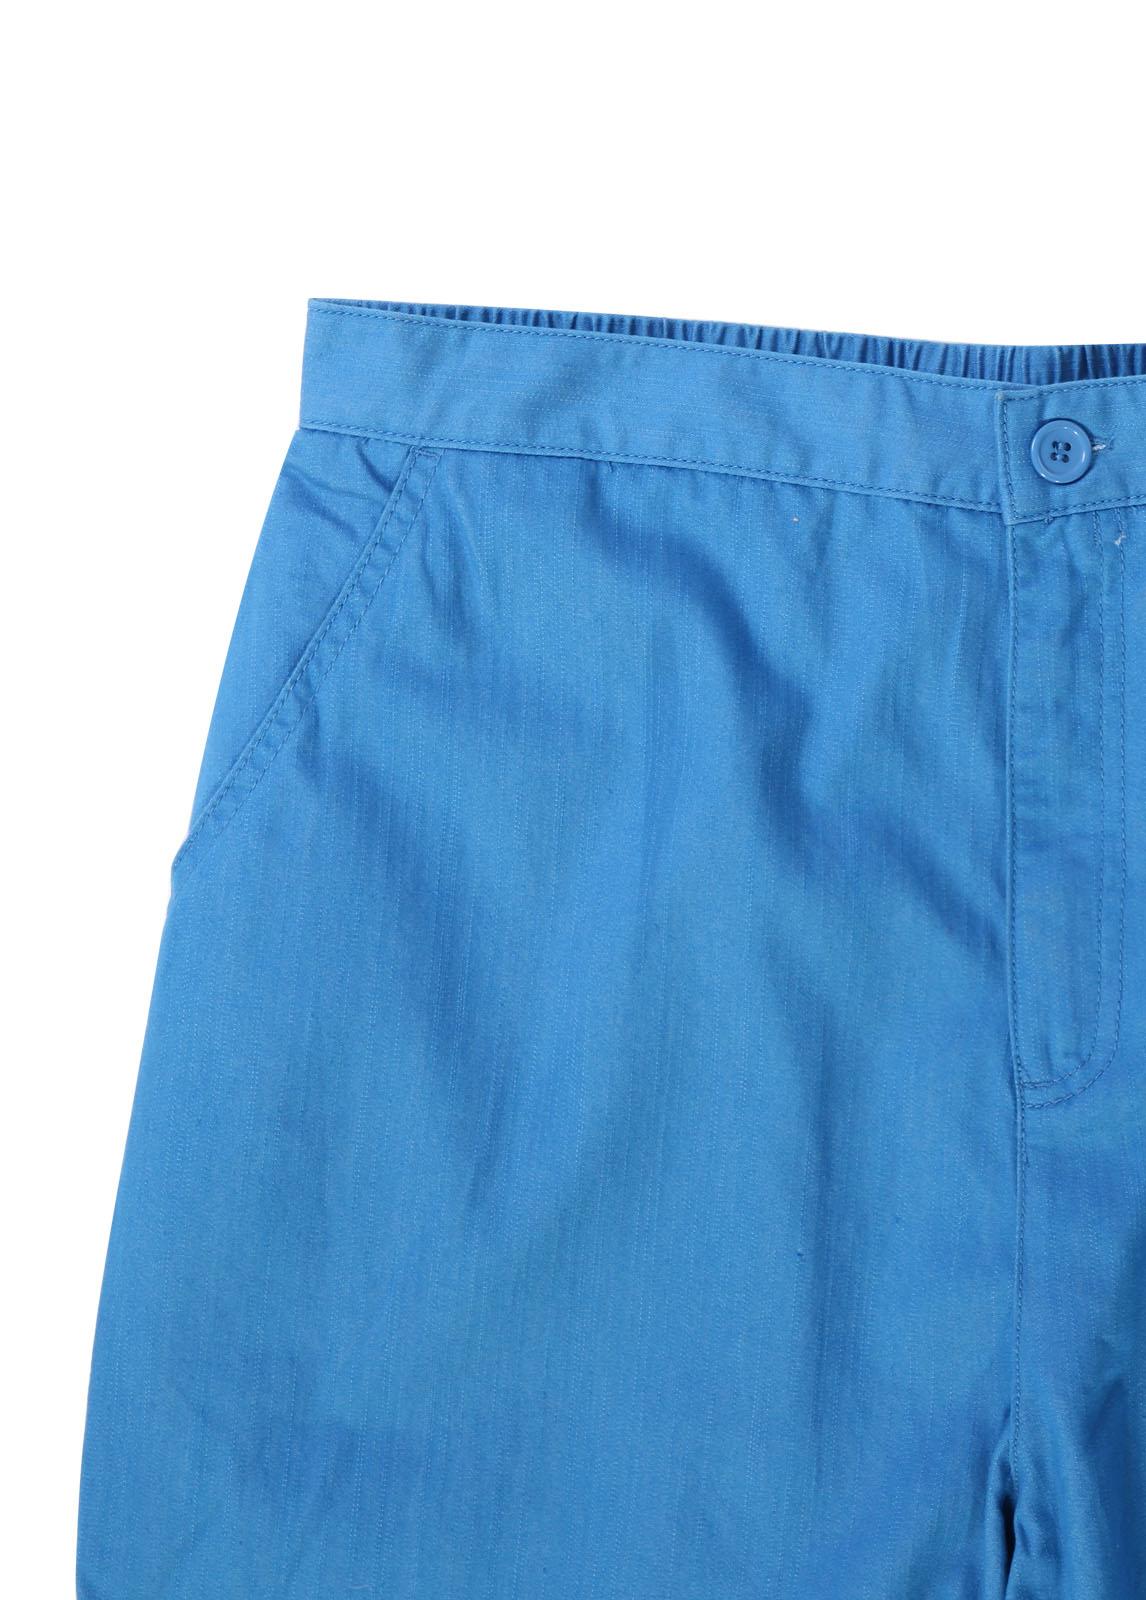 Excellent Koret Womens Elastic Waist Casual Denim Pants Cropped Jeans Shorts